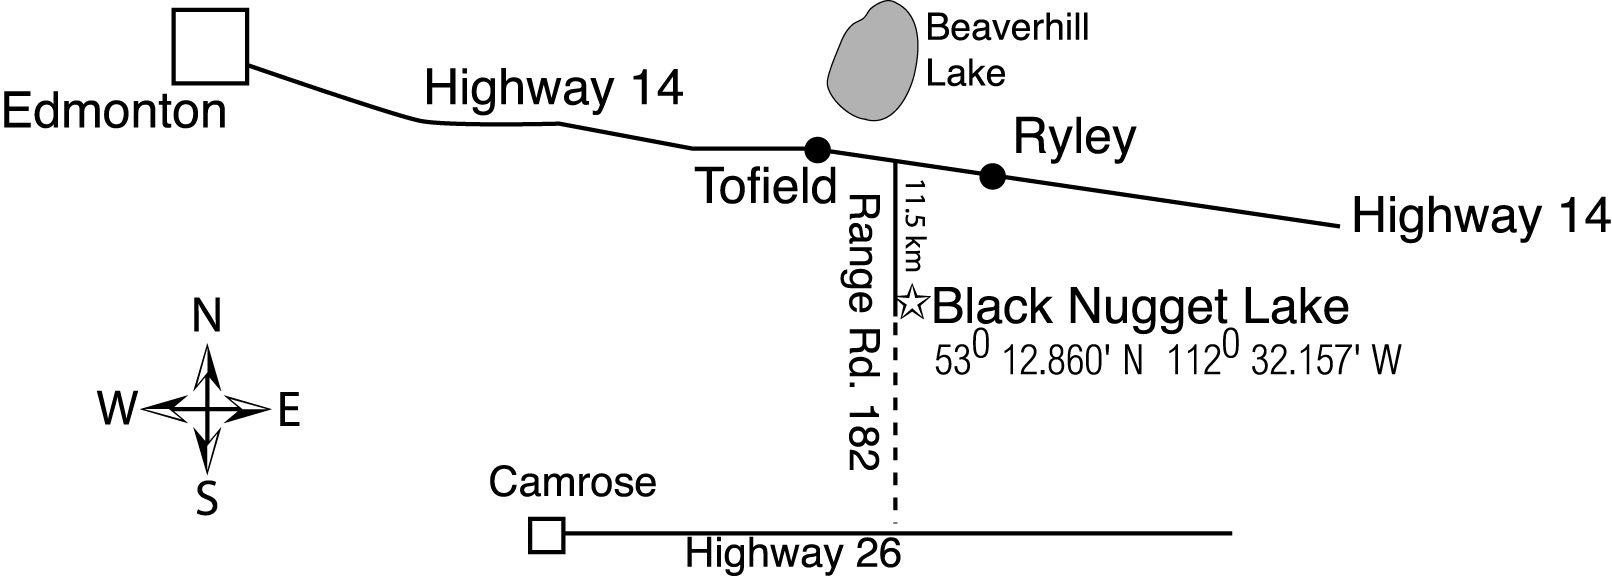 Black Nugget Lake Dark Site